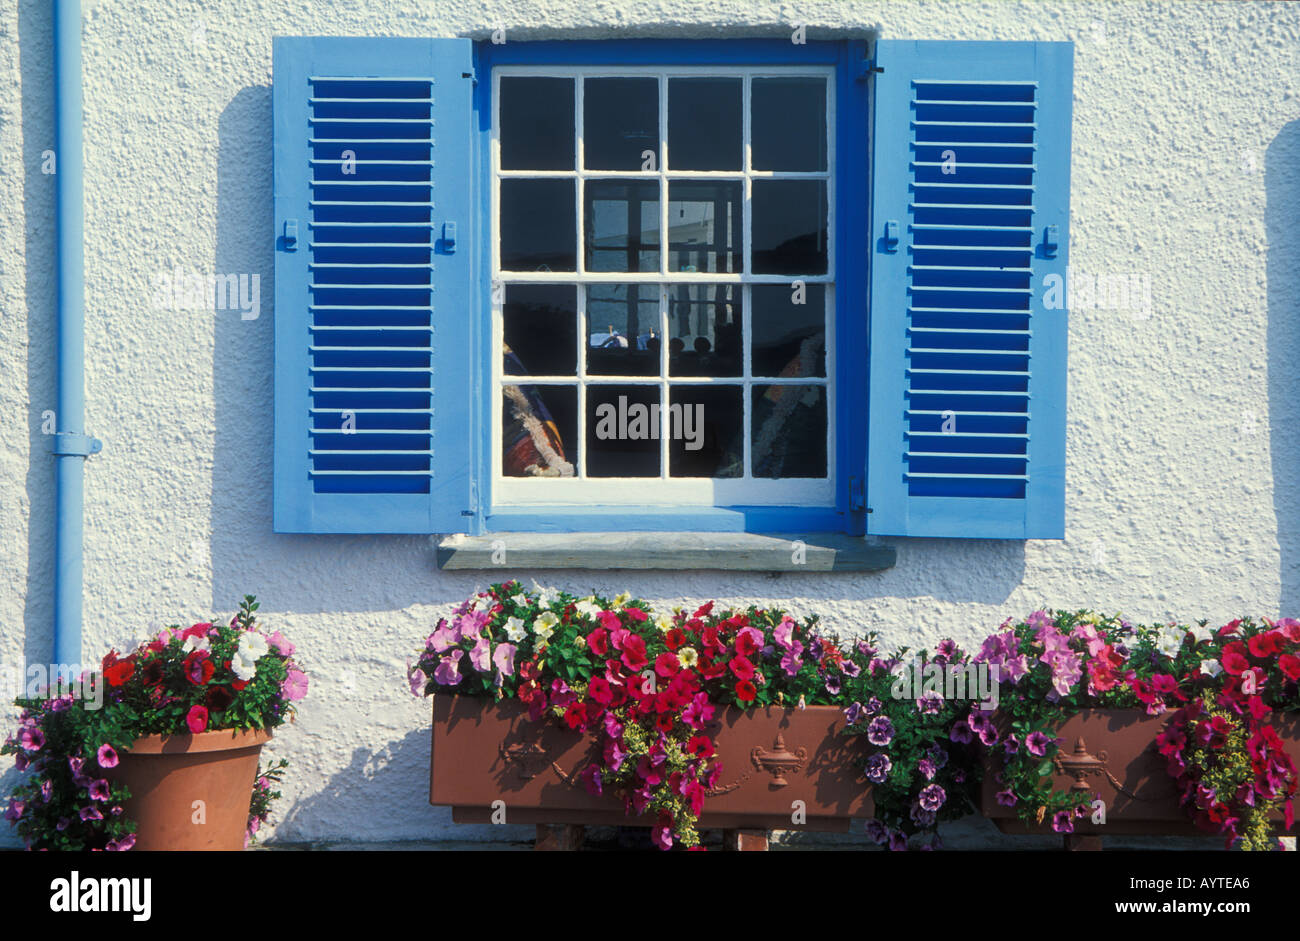 Casa Blanca Con Paredes Pintadas De Azul Y Persianas De Ventana De - Paredes-pintadas-de-azul